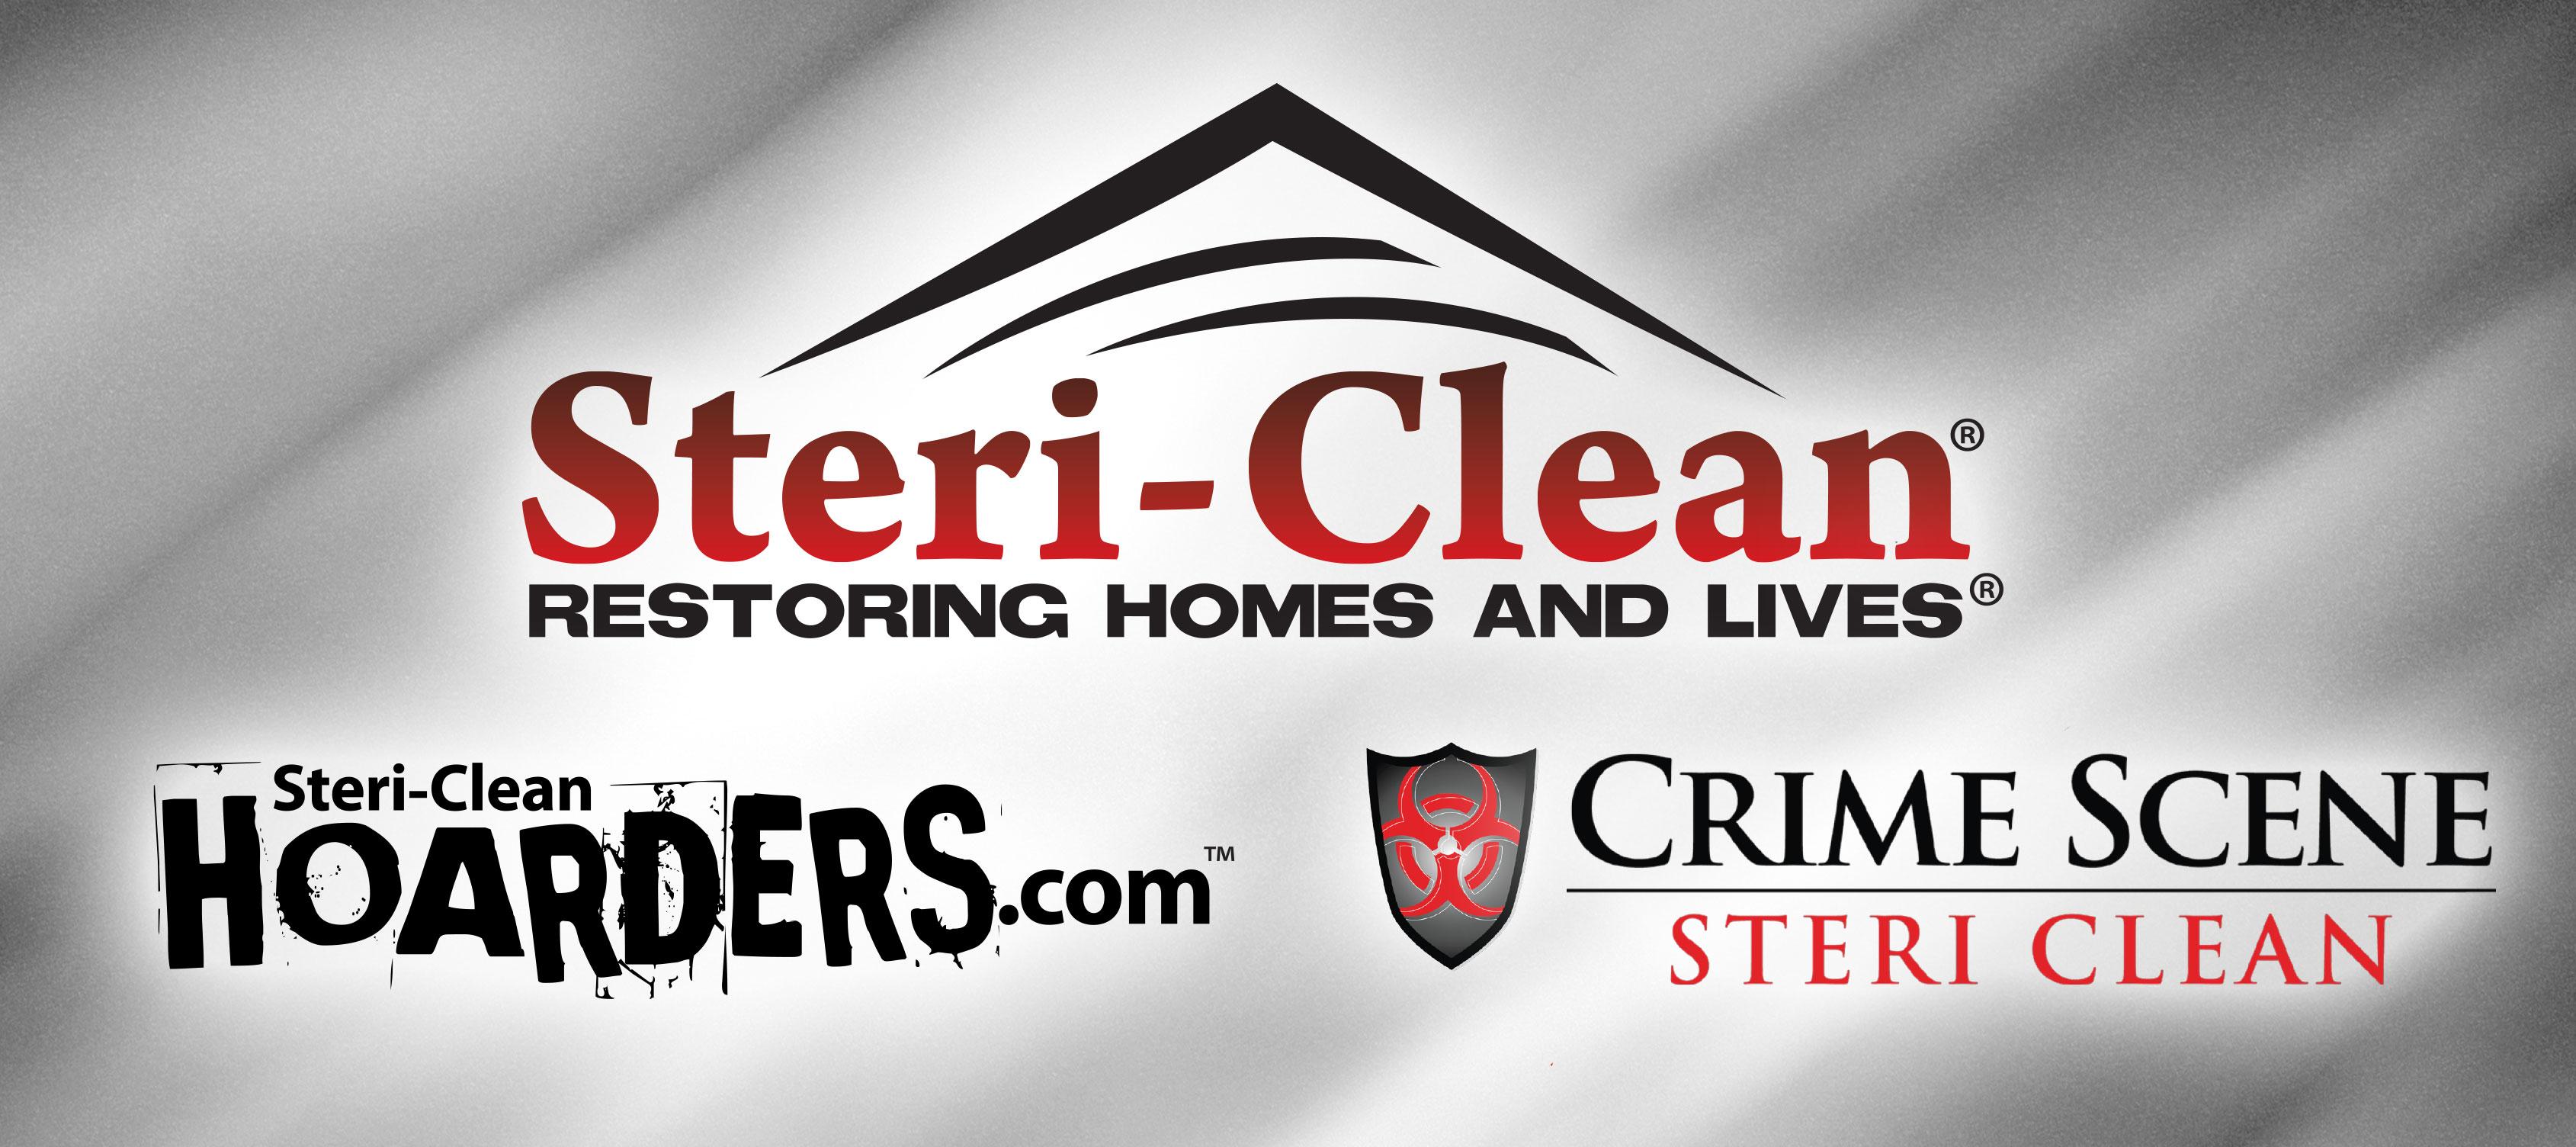 Steri-Clean